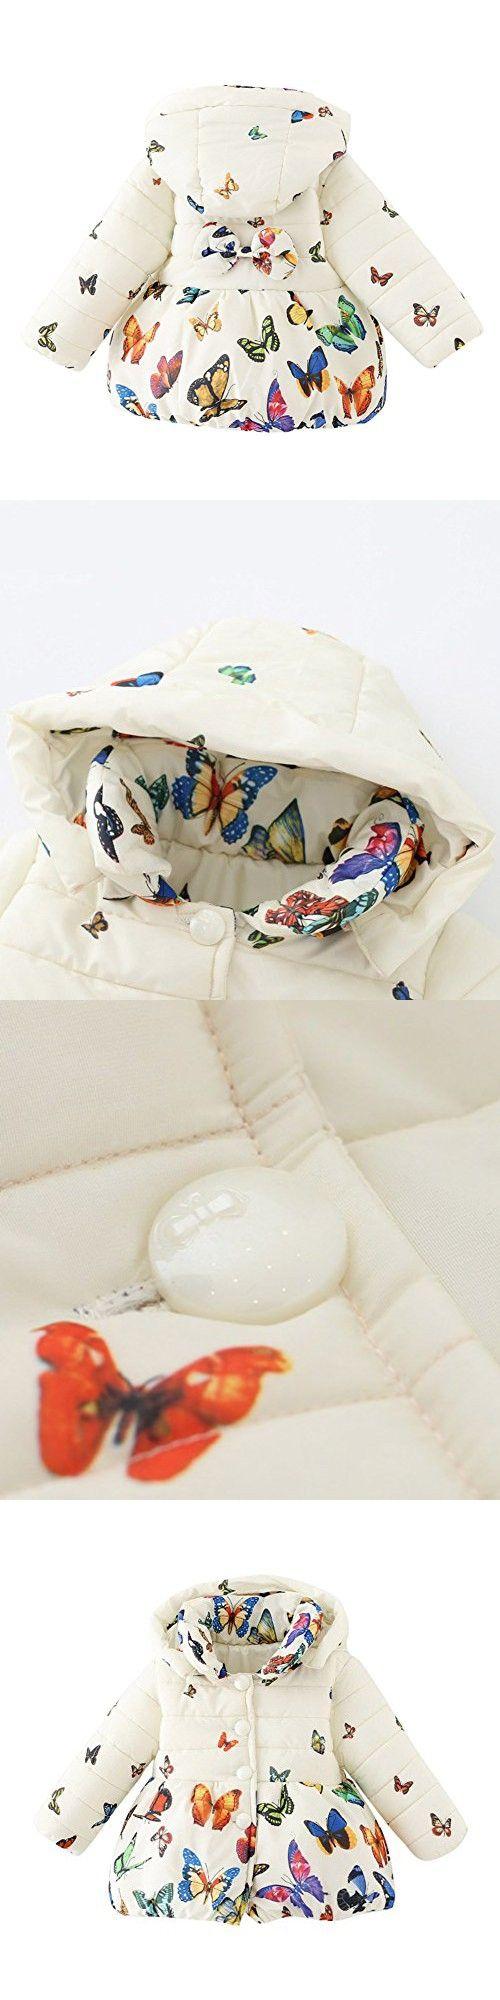 Jlong Baby Girls Winter Warm Soft Cotton Butterfly Long Sleeves Coat Jacket